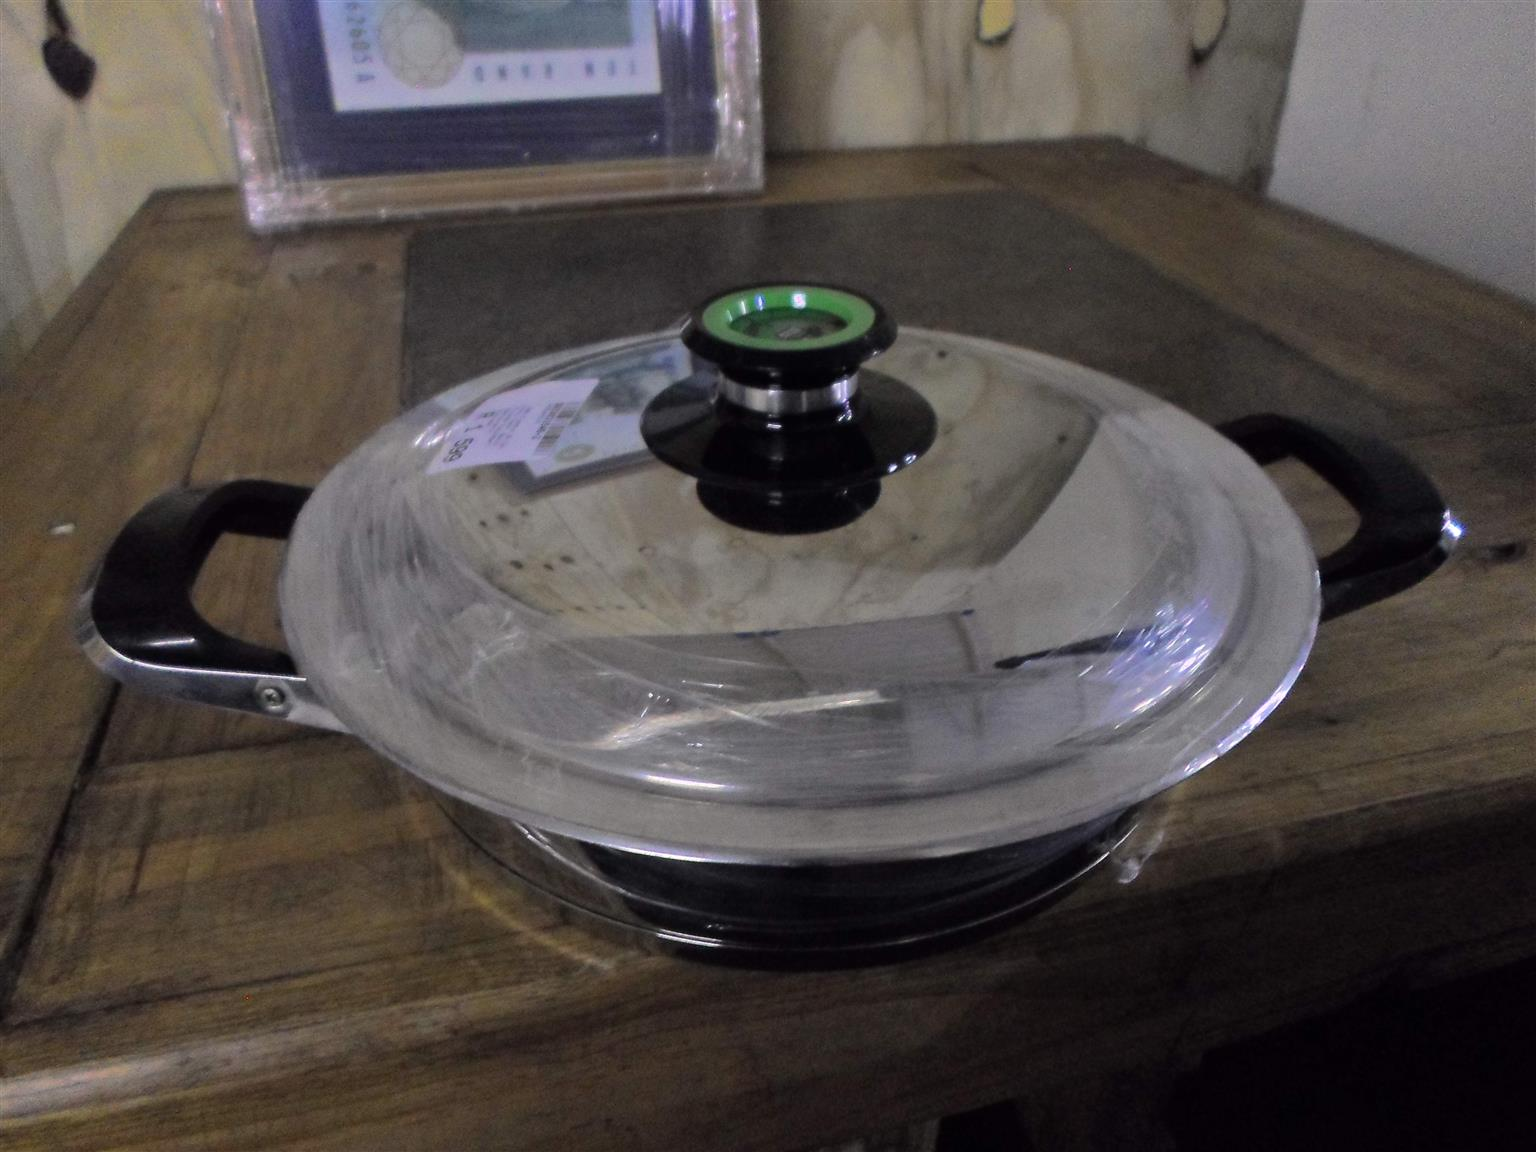 AMC 24cm Pot.